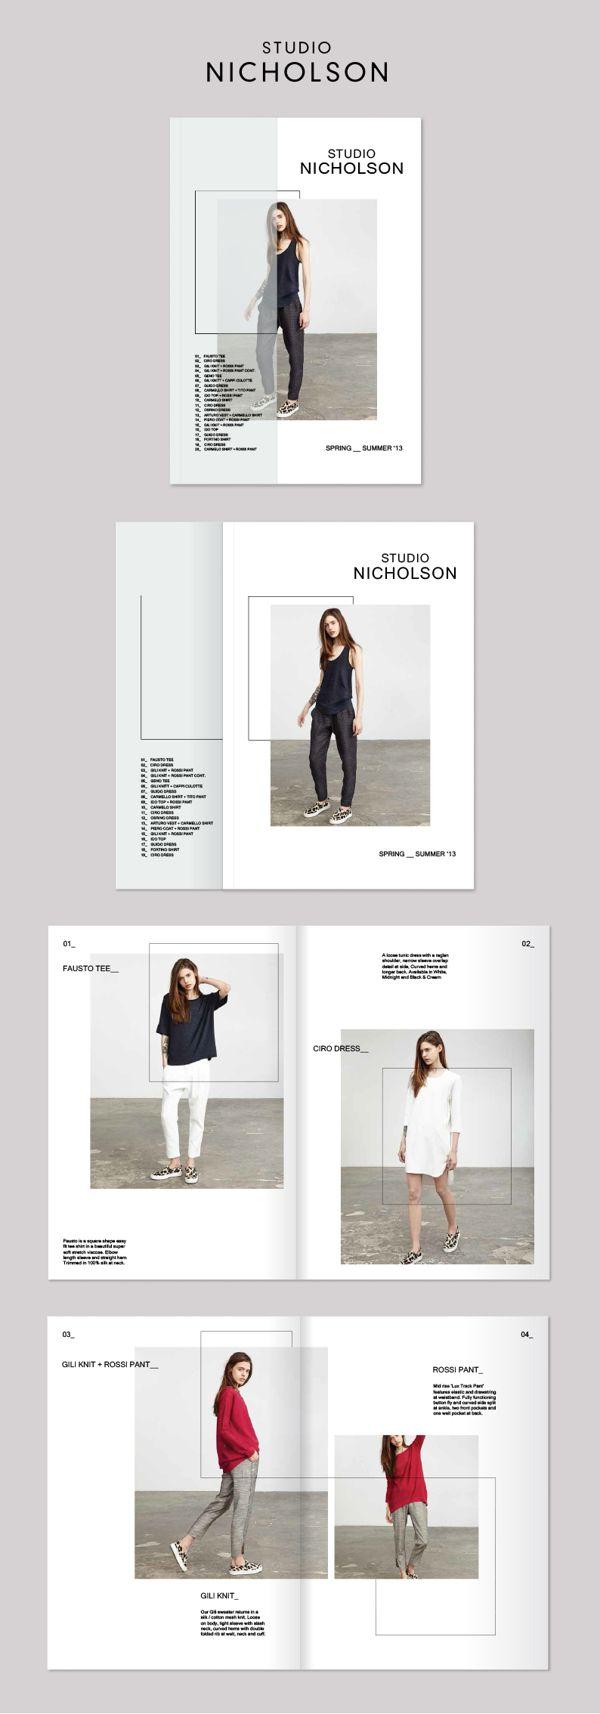 Studio Nicholson Lookbook by Rebecca Moores, via Behance